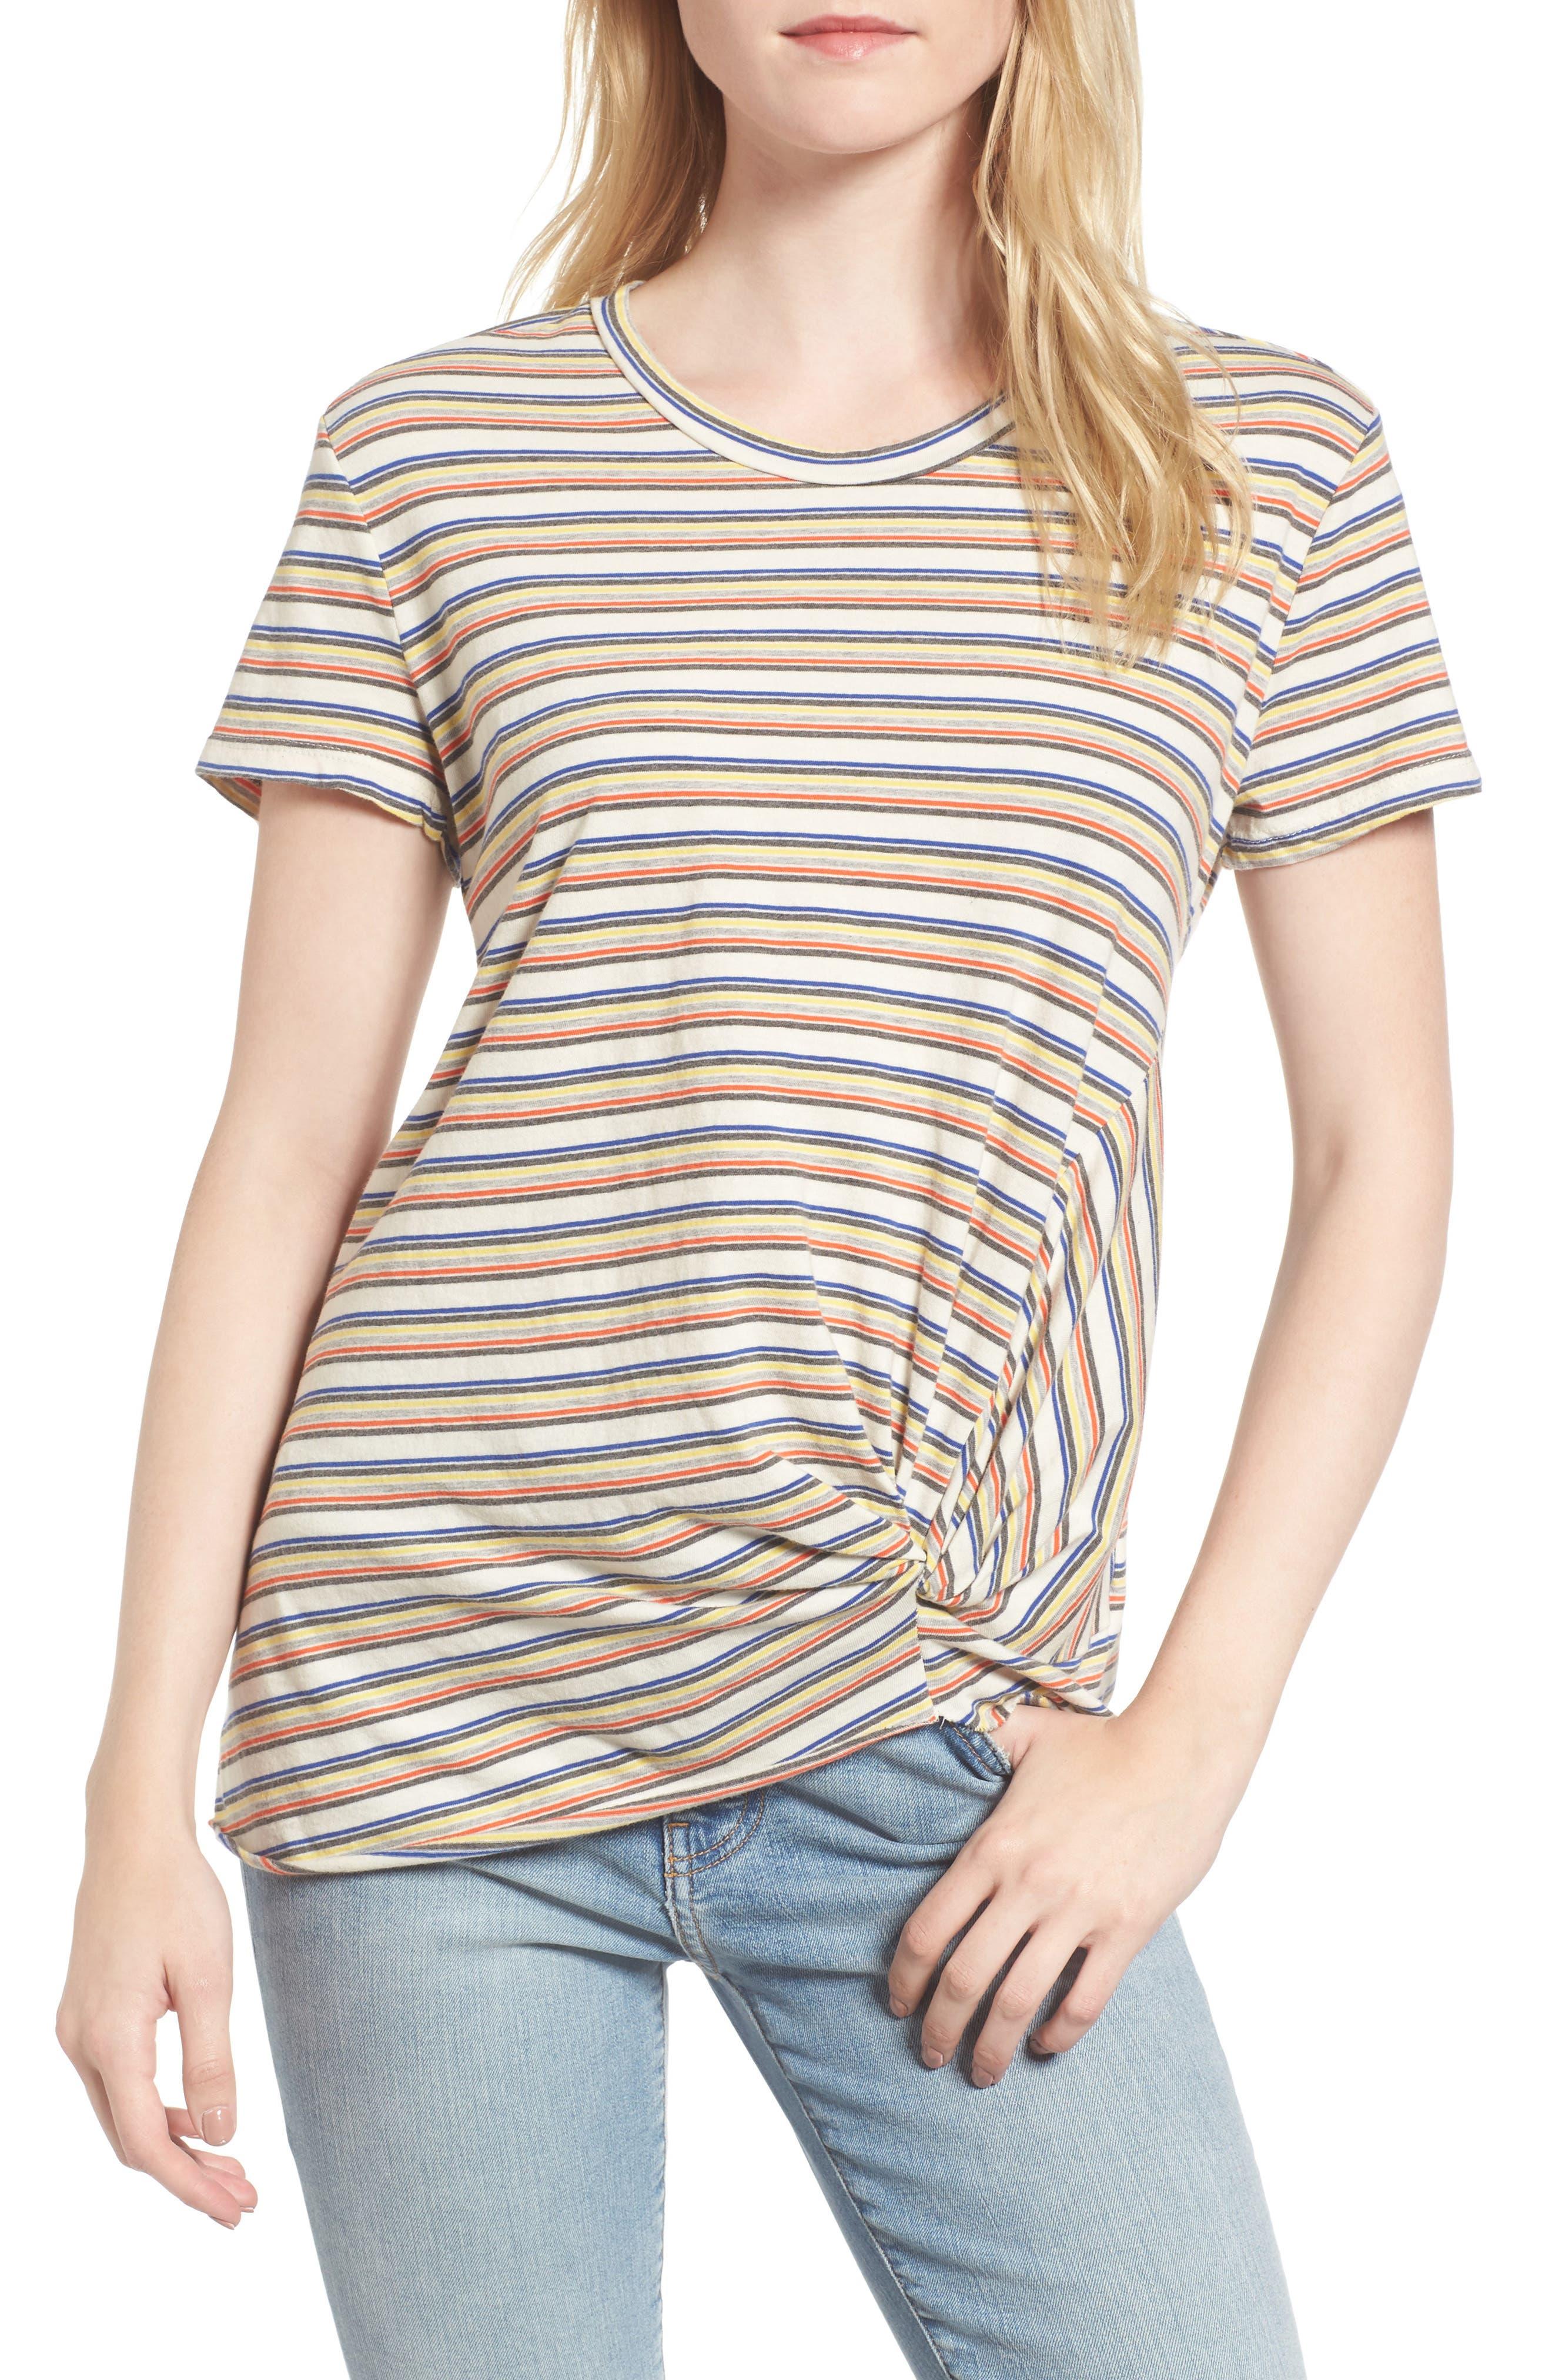 Main Image - Stateside Stripe Twist Front Tee